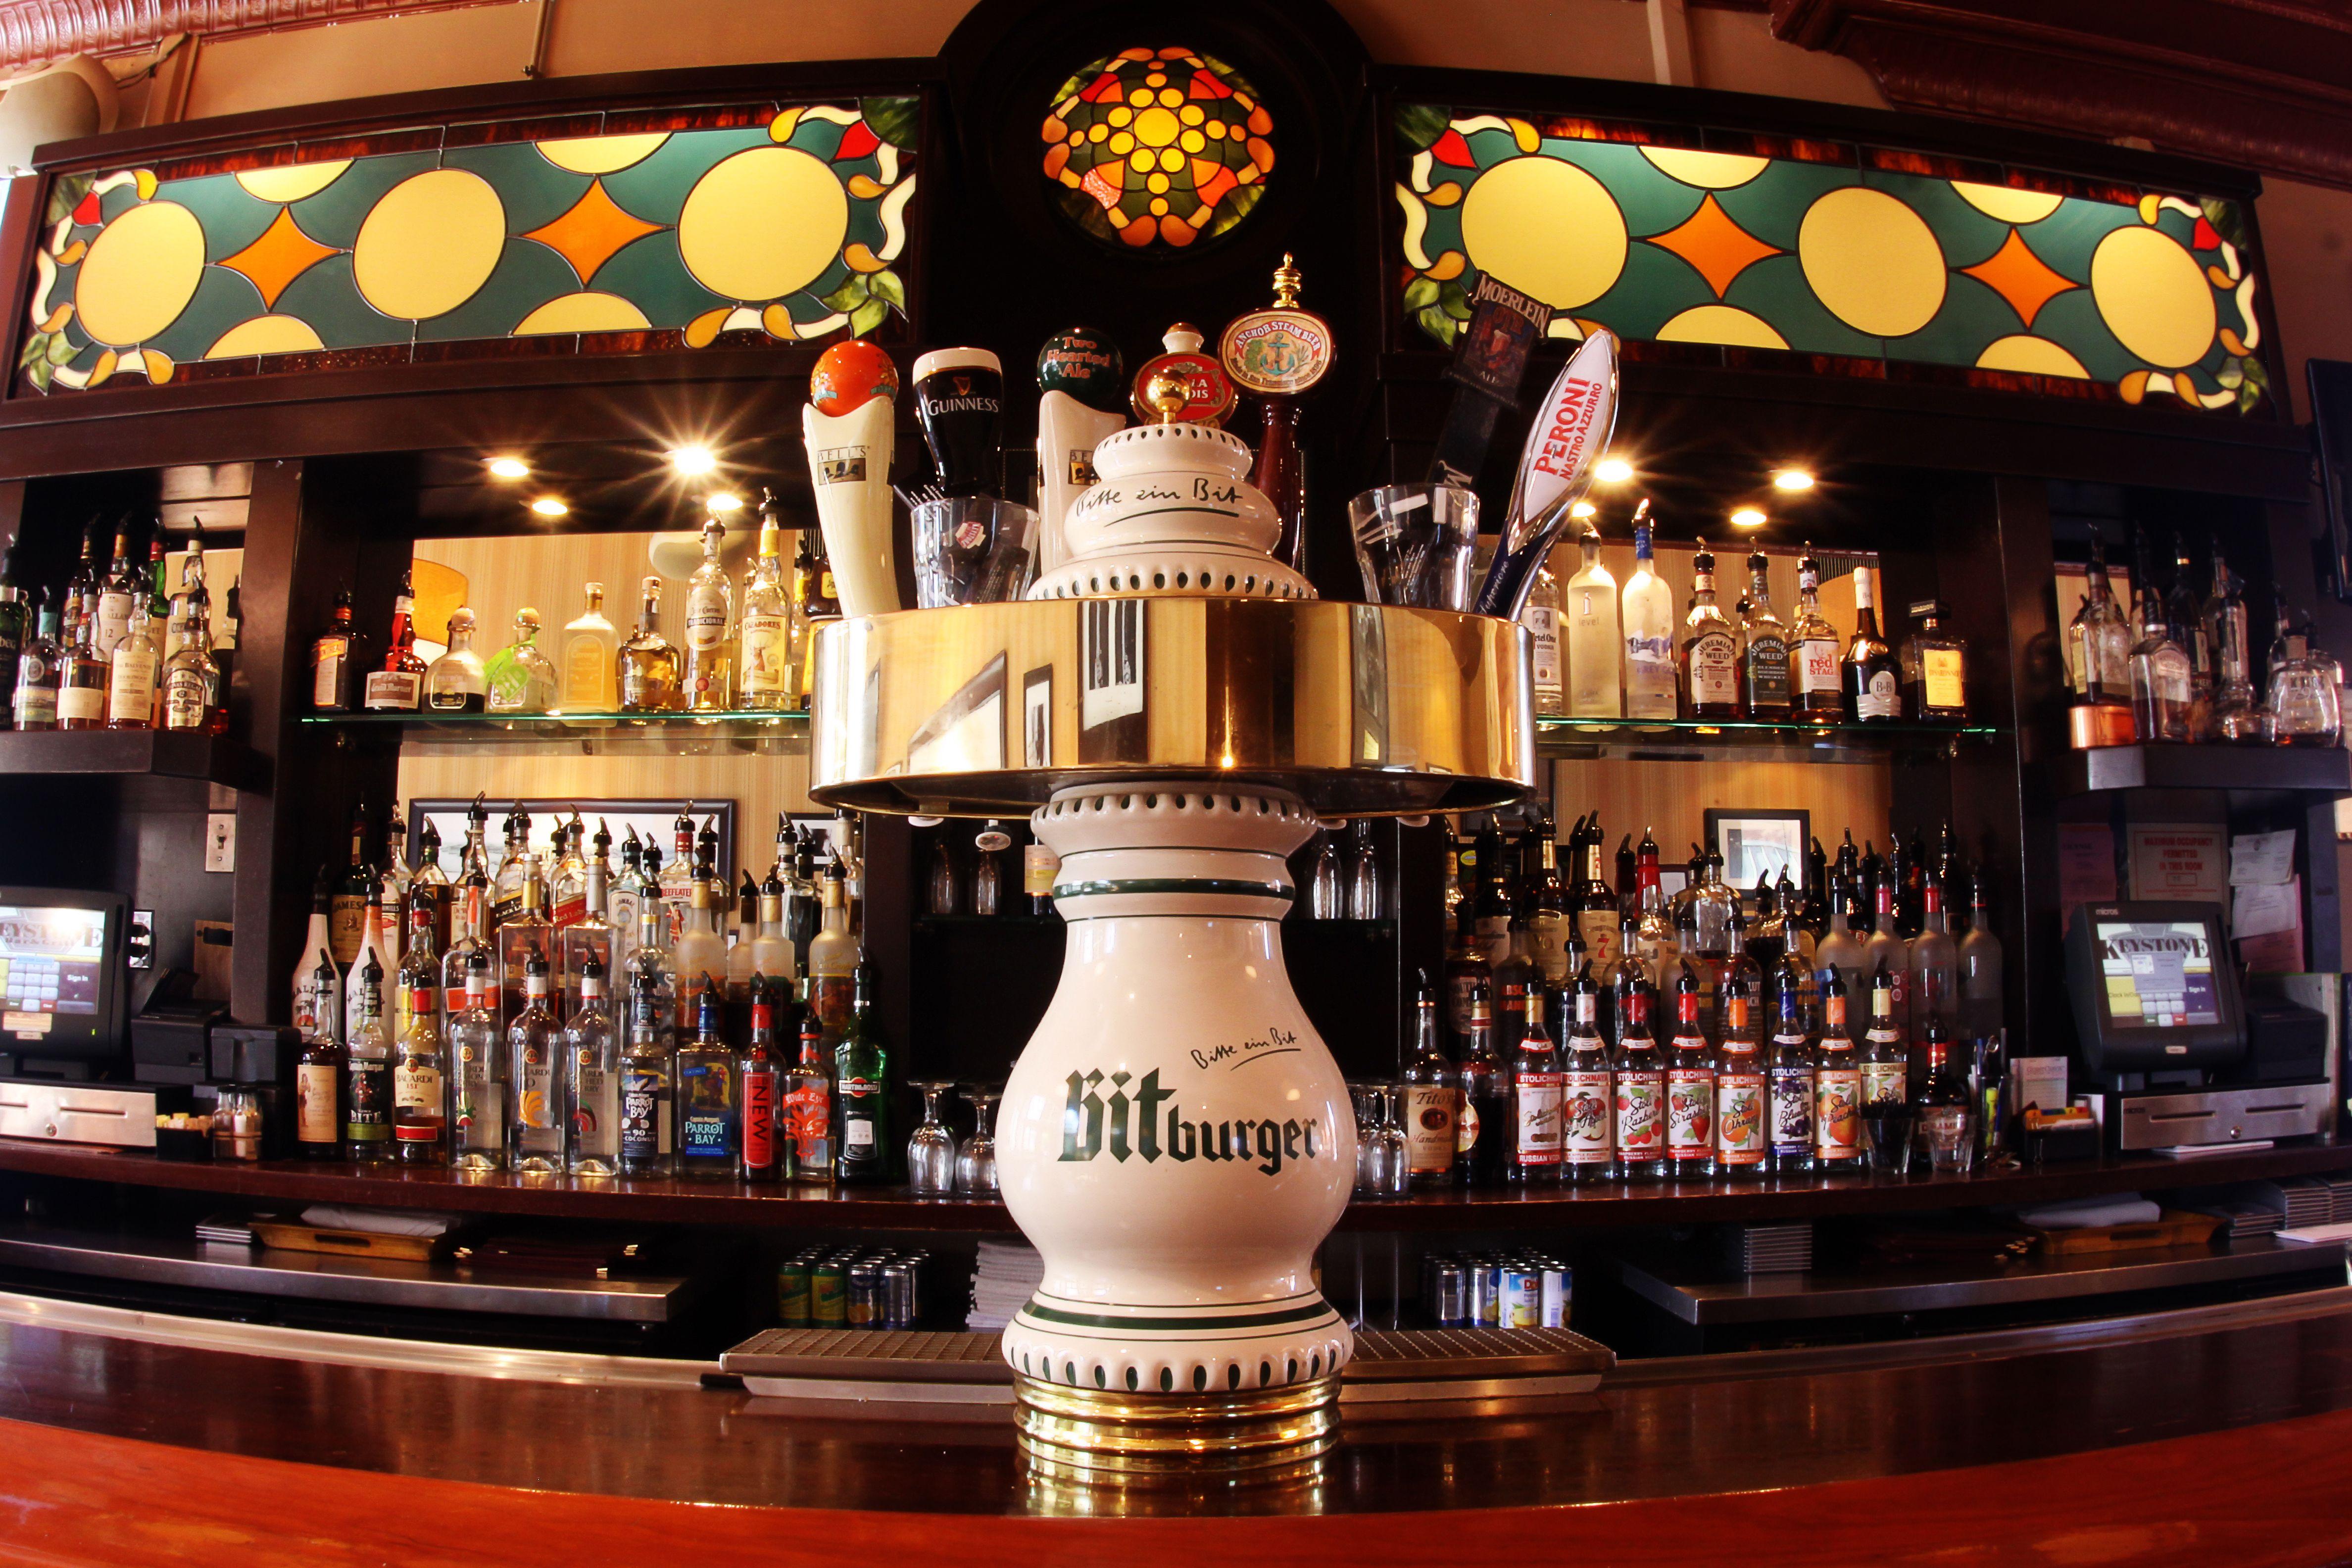 39+ Craft beer market menu ideas in 2021